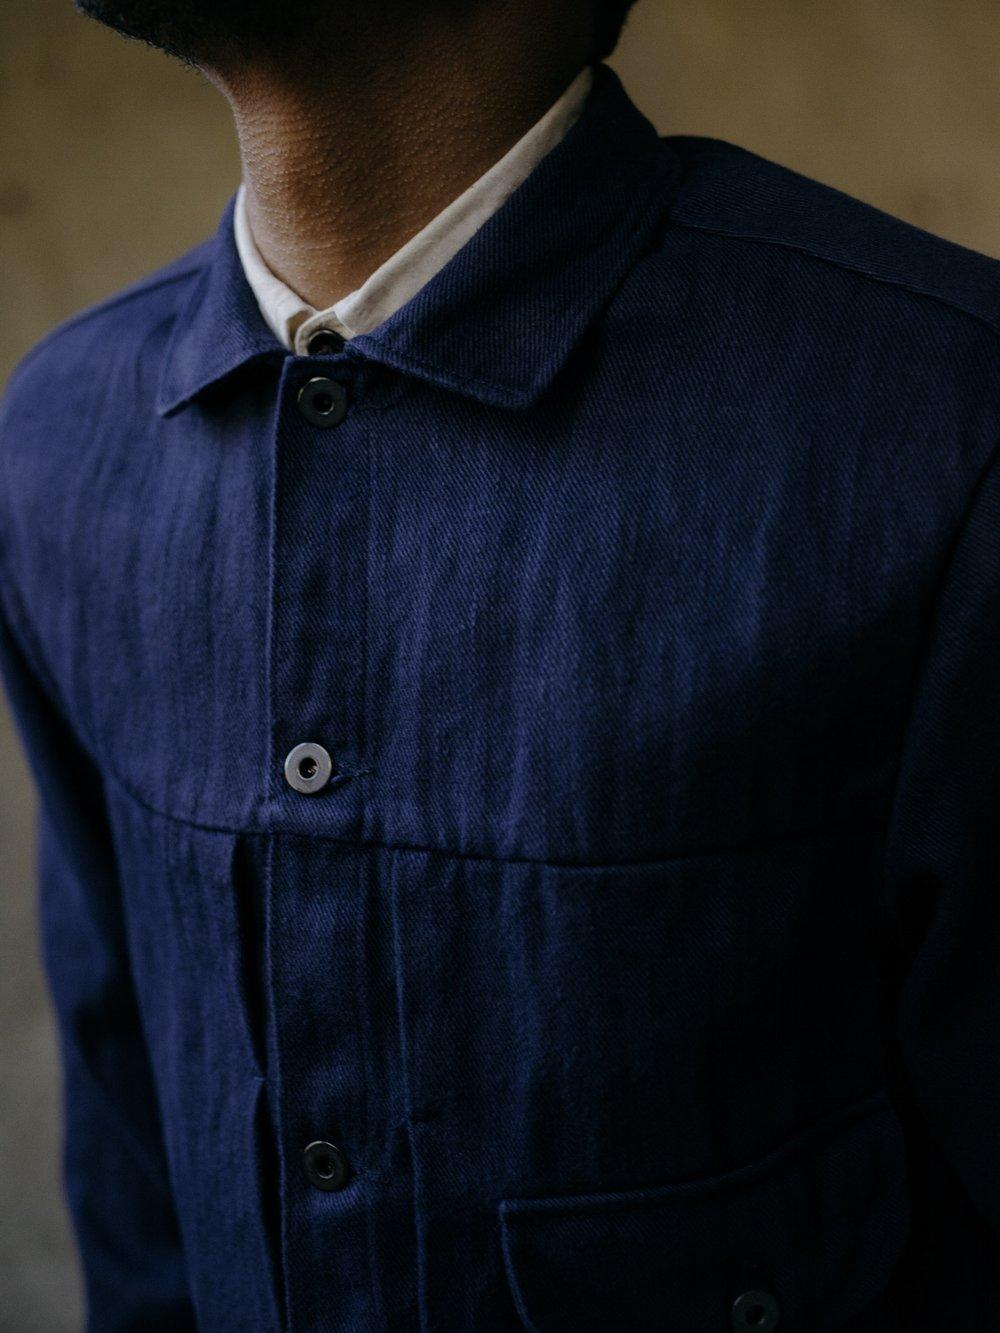 evan-kinori-pleated-jacket-french-blue-hemp-twill-2